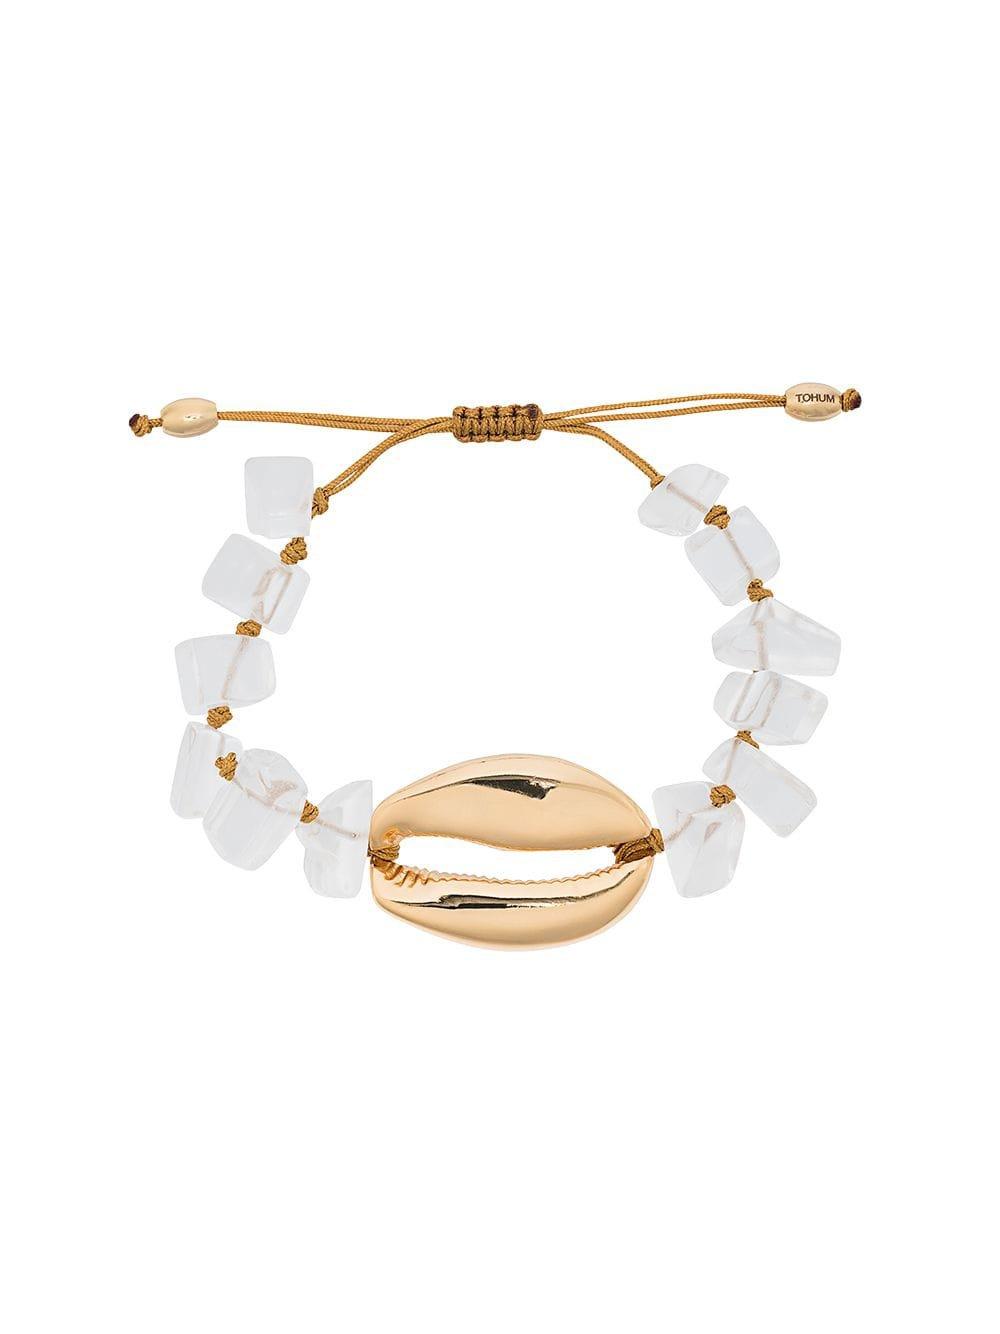 Tohum Metallic Puka Shell gold-plated Bracelet - Farfetch